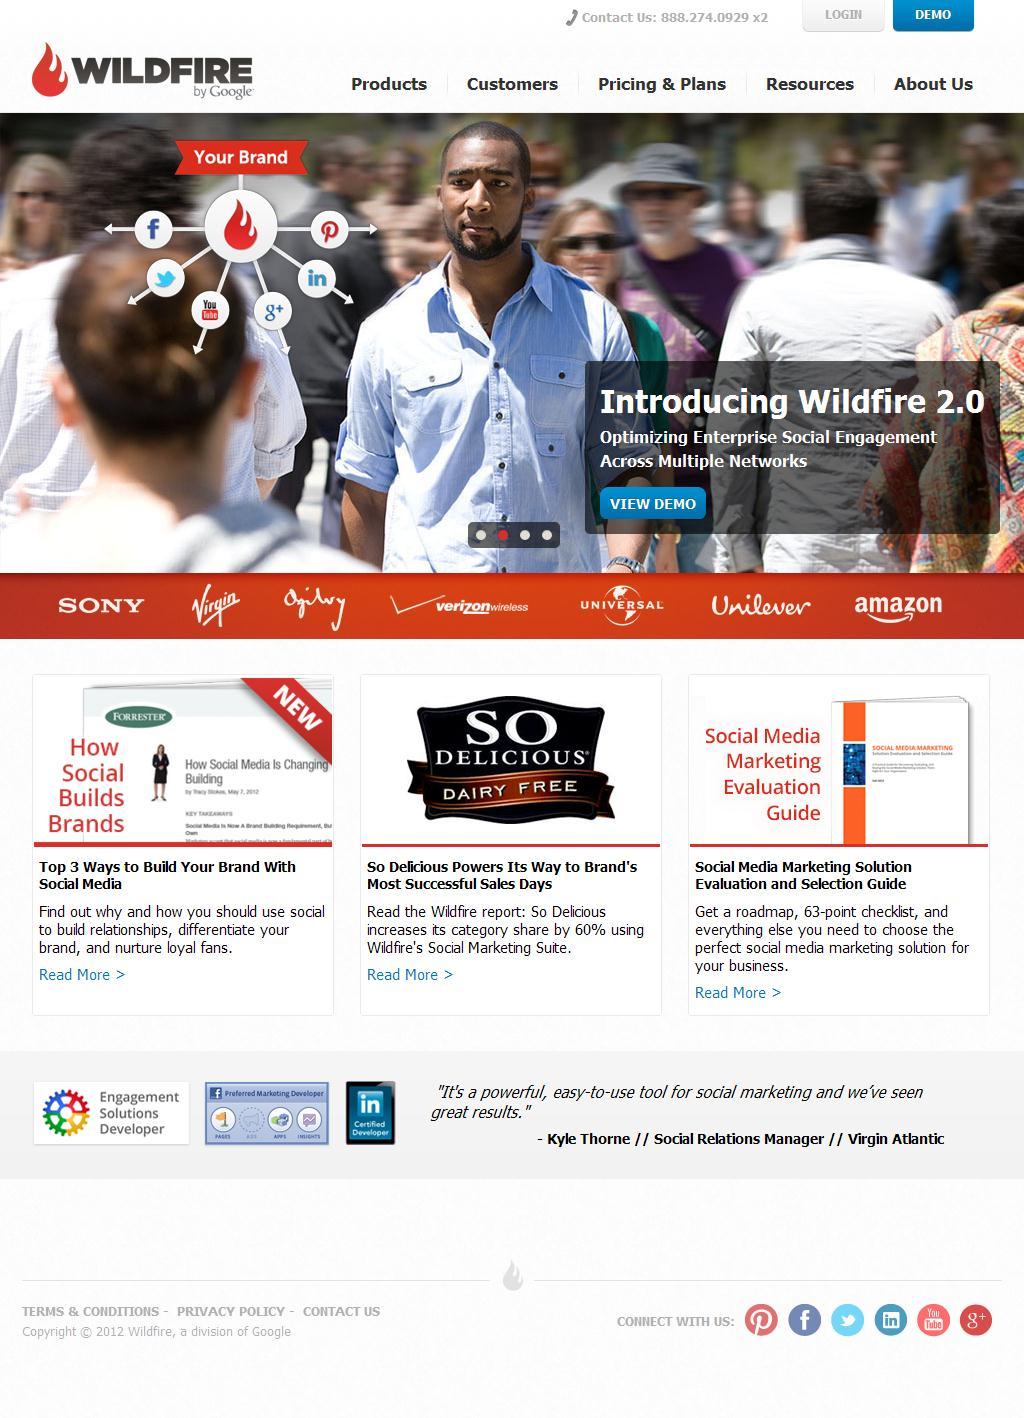 Wildfire | Complete Enterprise Social Media Marketing Software